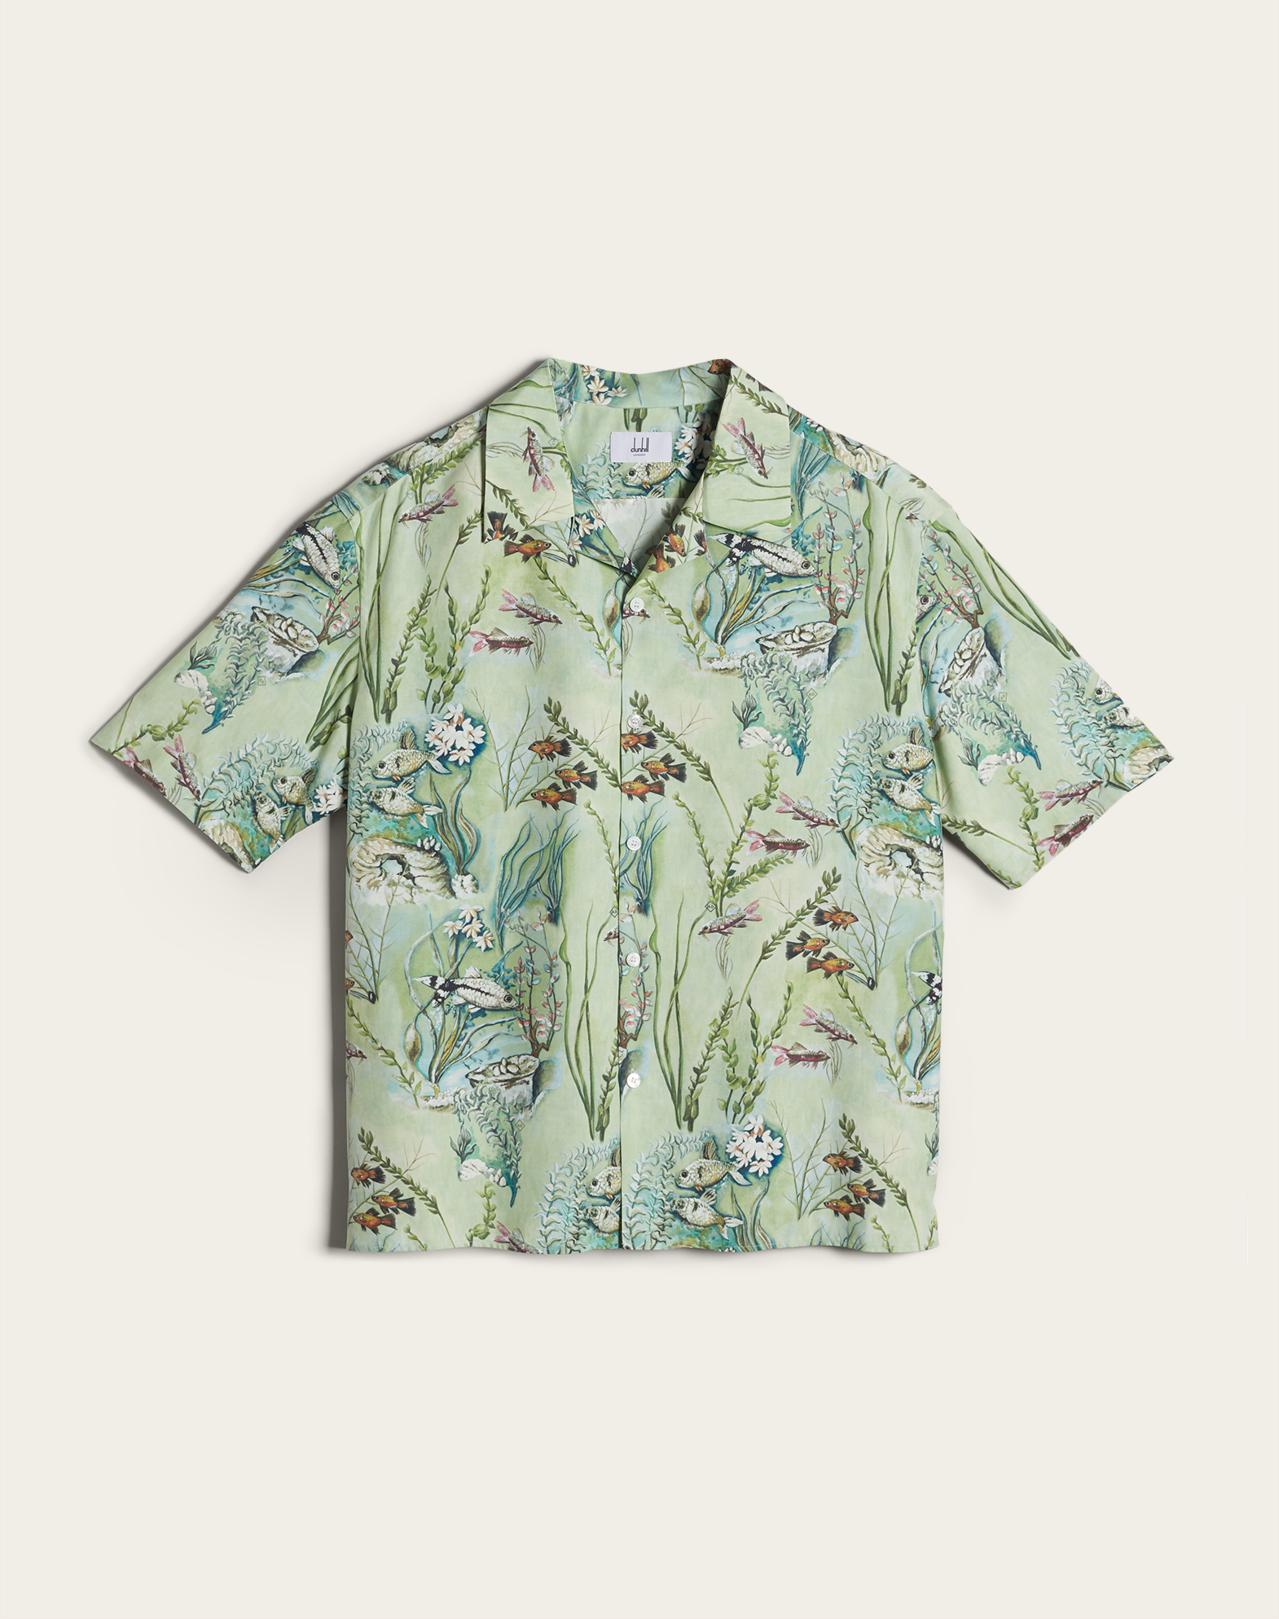 Aquarium迷你限量系列休閒襯衫,價格店洽。圖/dunhill提供